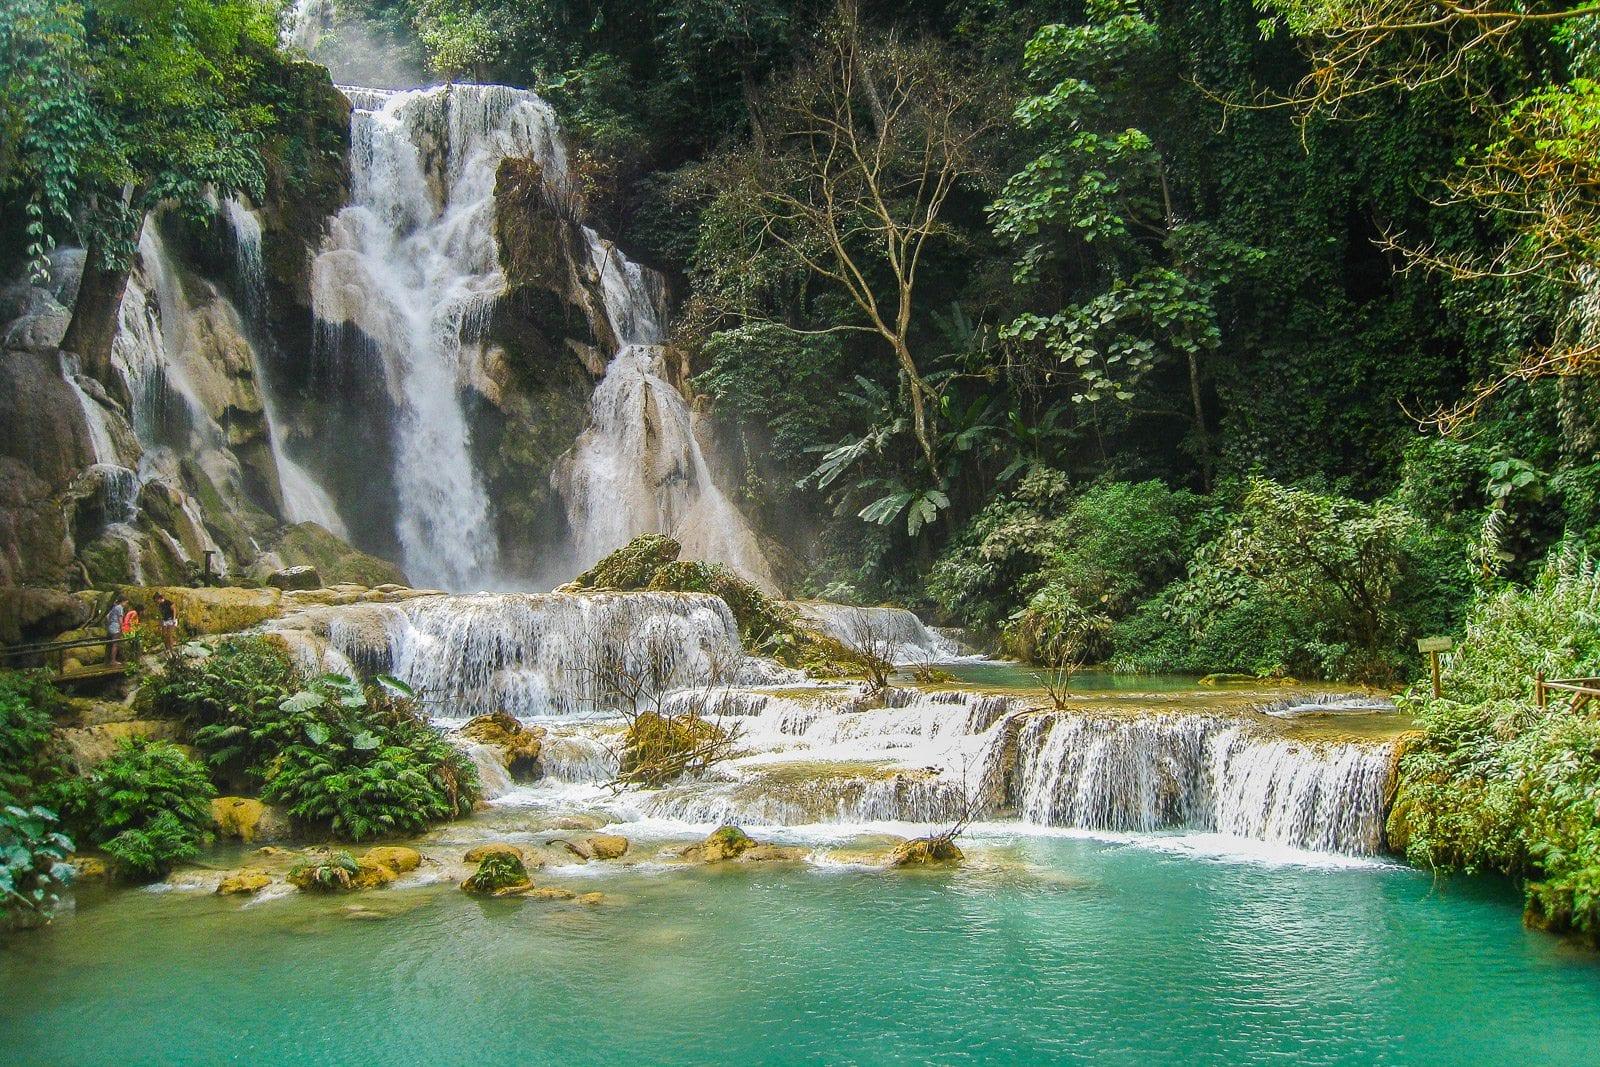 The stunning Kuang Si Falls in Luang Prabang, Laos